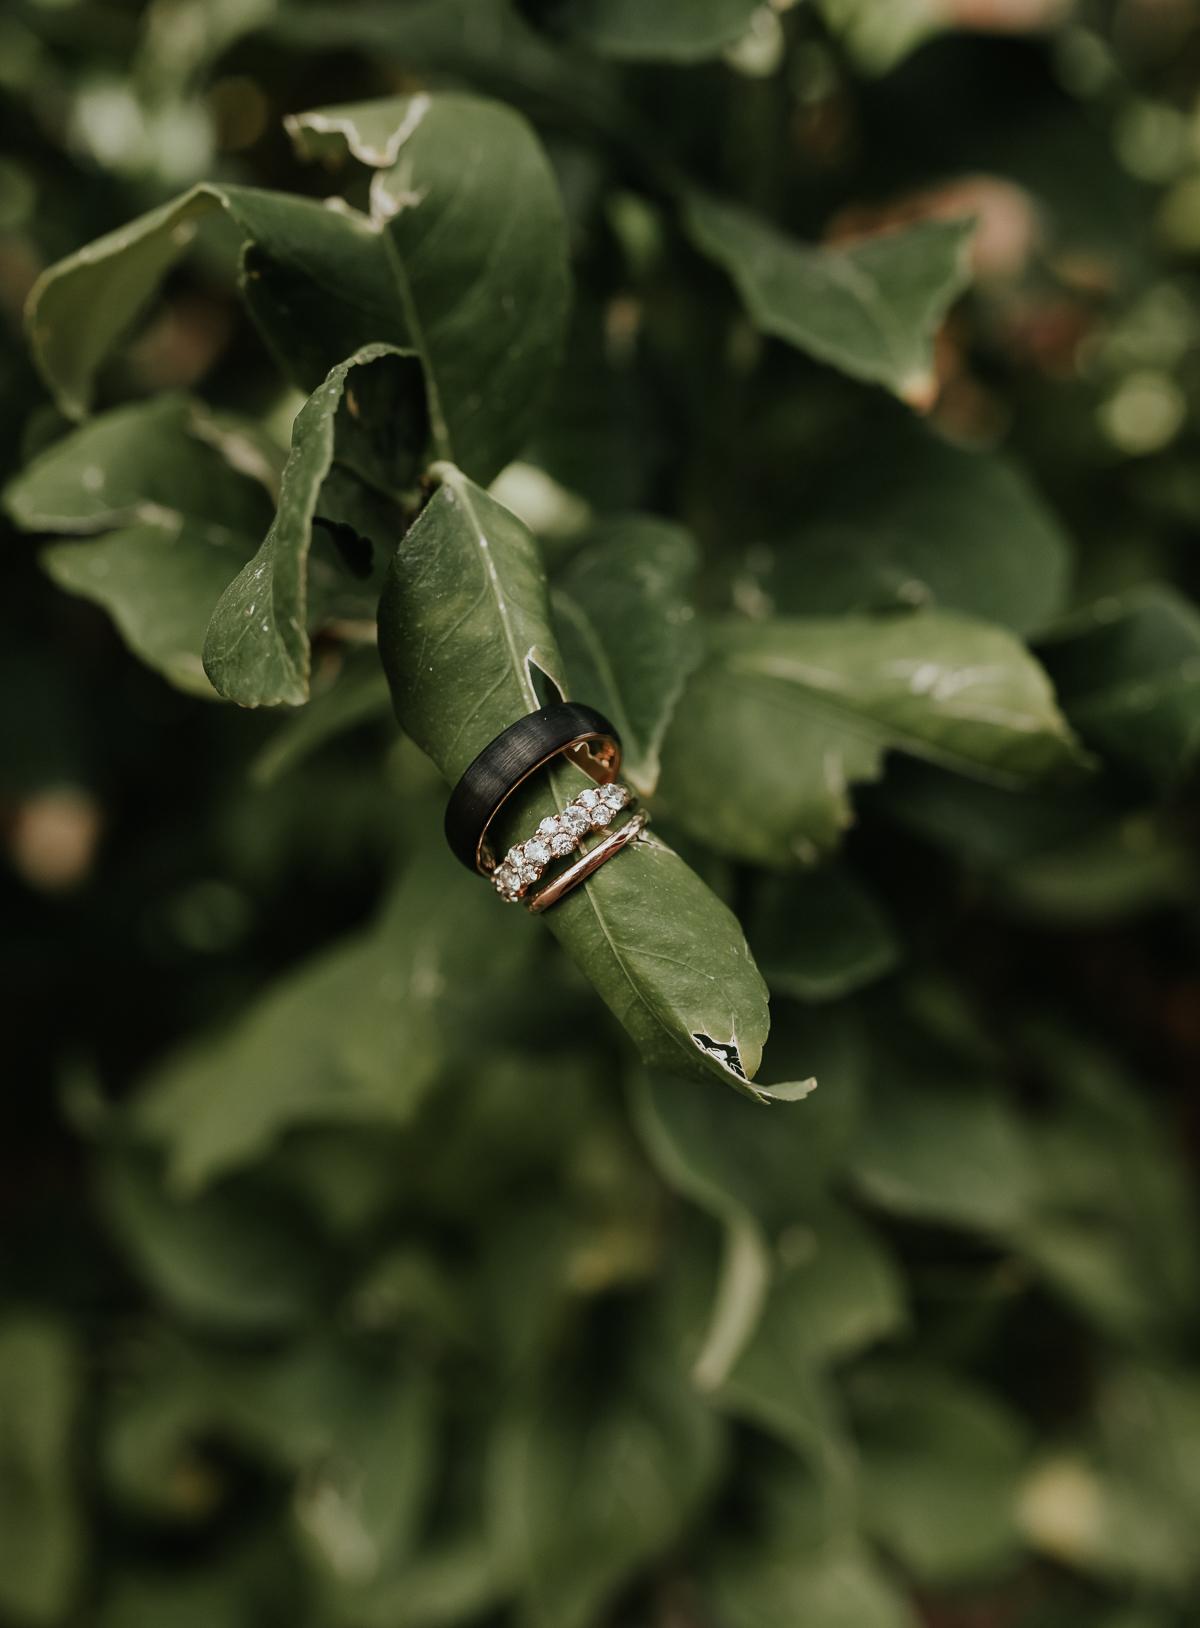 Megan Claire Photography | Arizona Wedding Photographer.  Rustic Glam Backyard Wedding